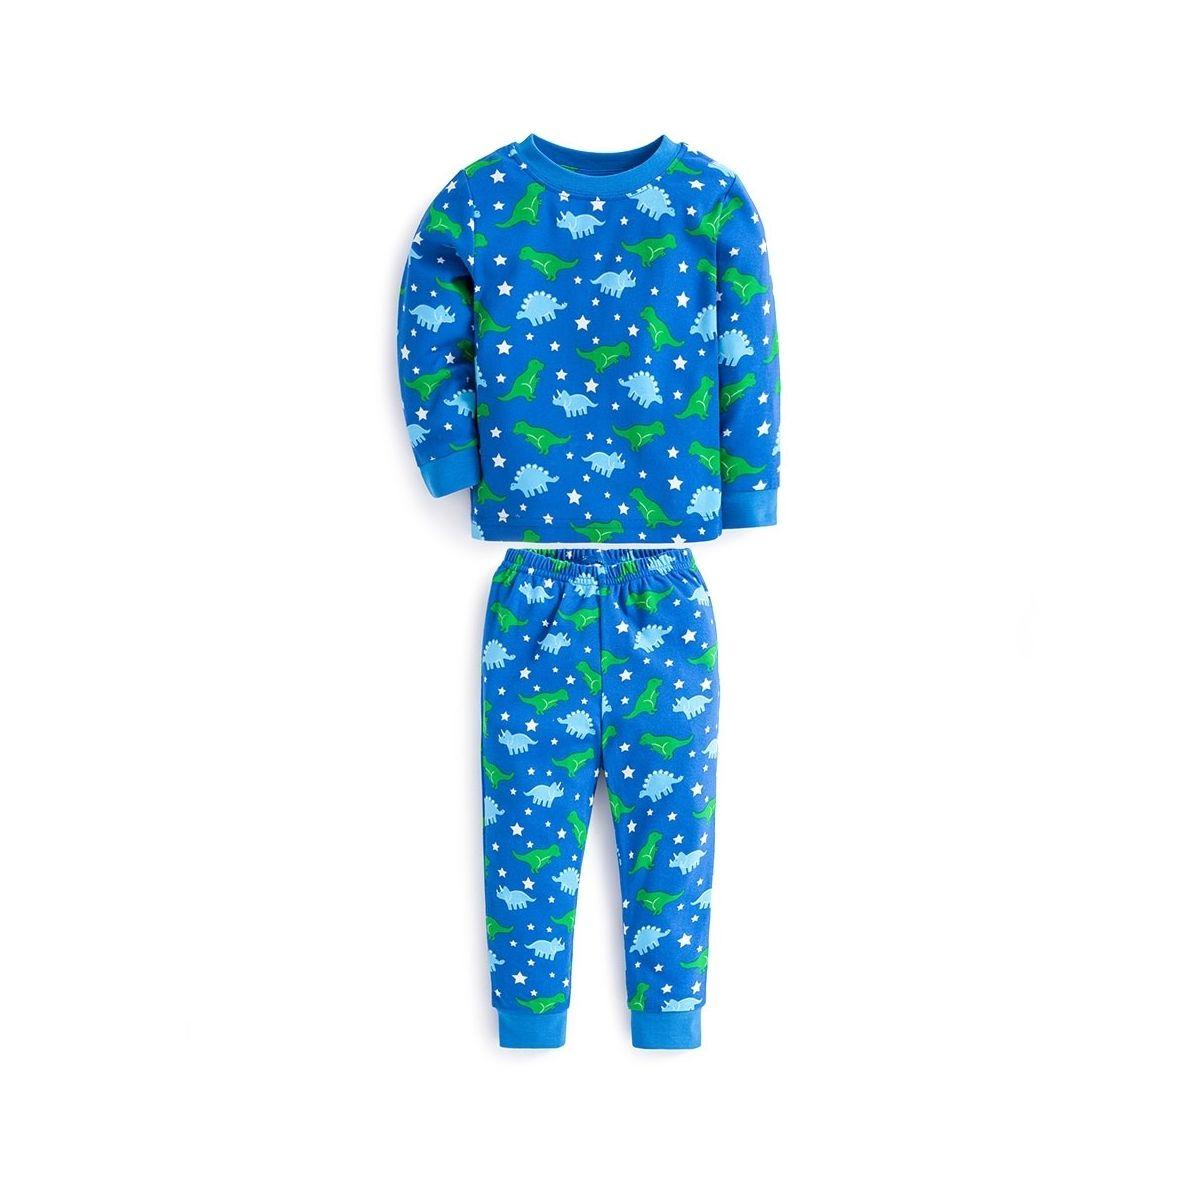 c916218b7 Pijama Niño Azul Dinosaurios Brilla Oscuridad - ShopMami